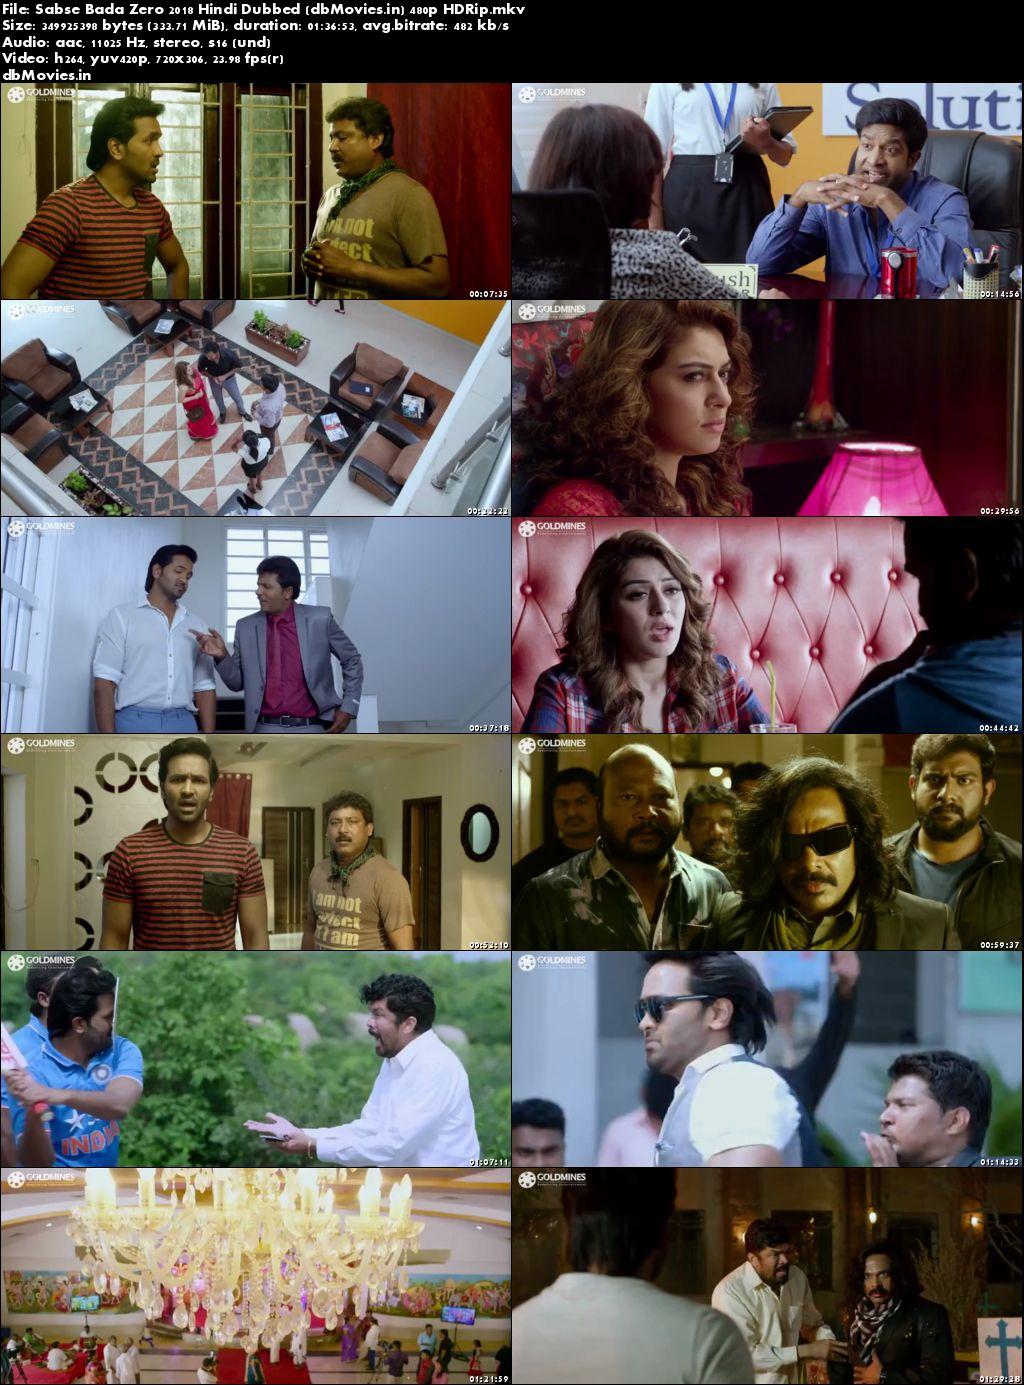 Poster Sabse Bada Zero 2018 Full HD Movie Download Hindi Dubbed 300Mb